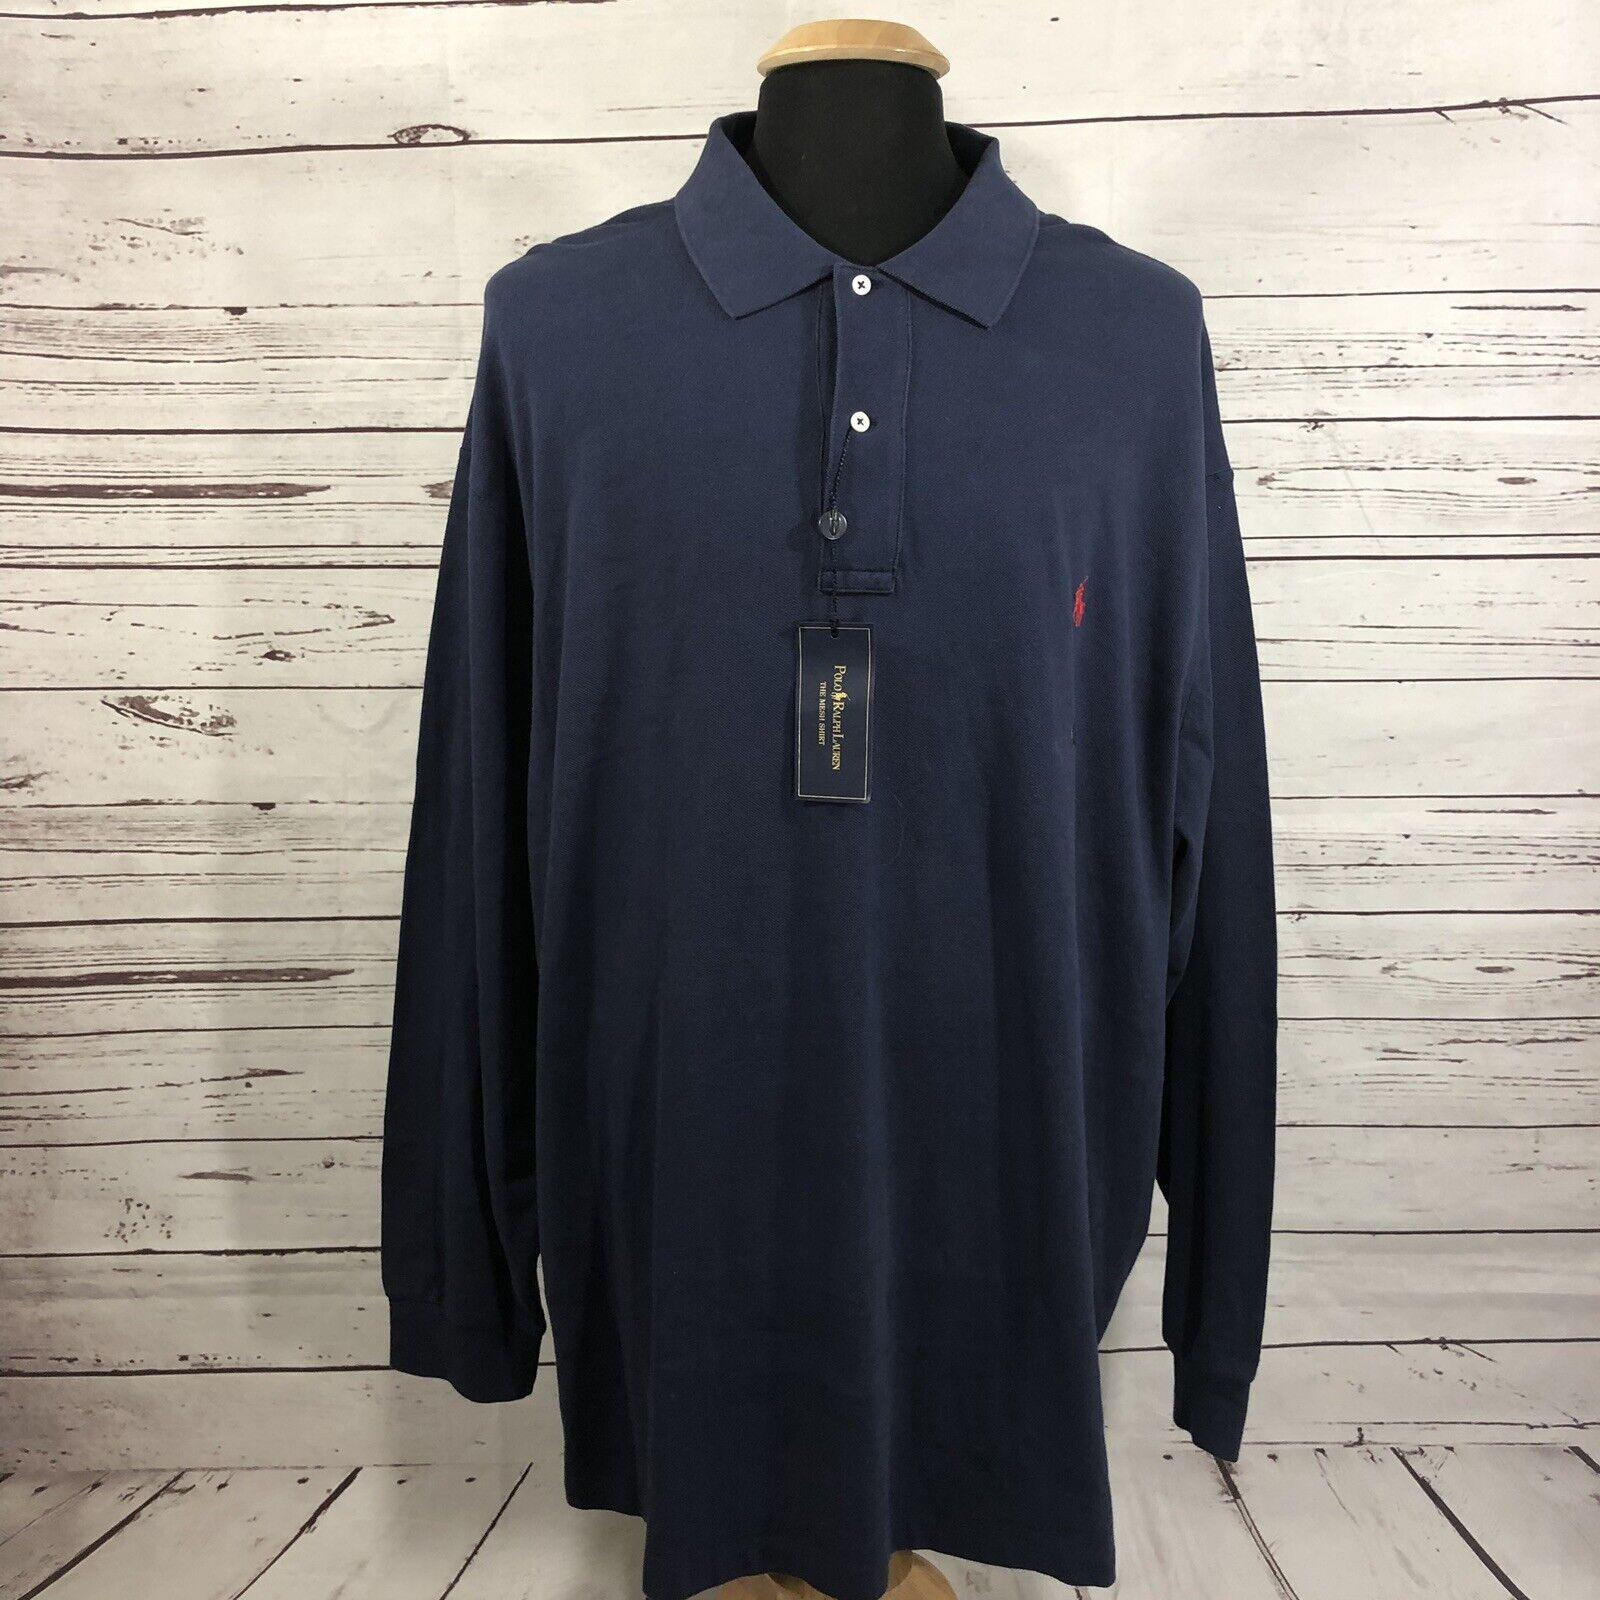 NWT Polo Ralph Lauren Navy bluee L S Polo Shirt Pony 100% Cotton Men's 4XB Big